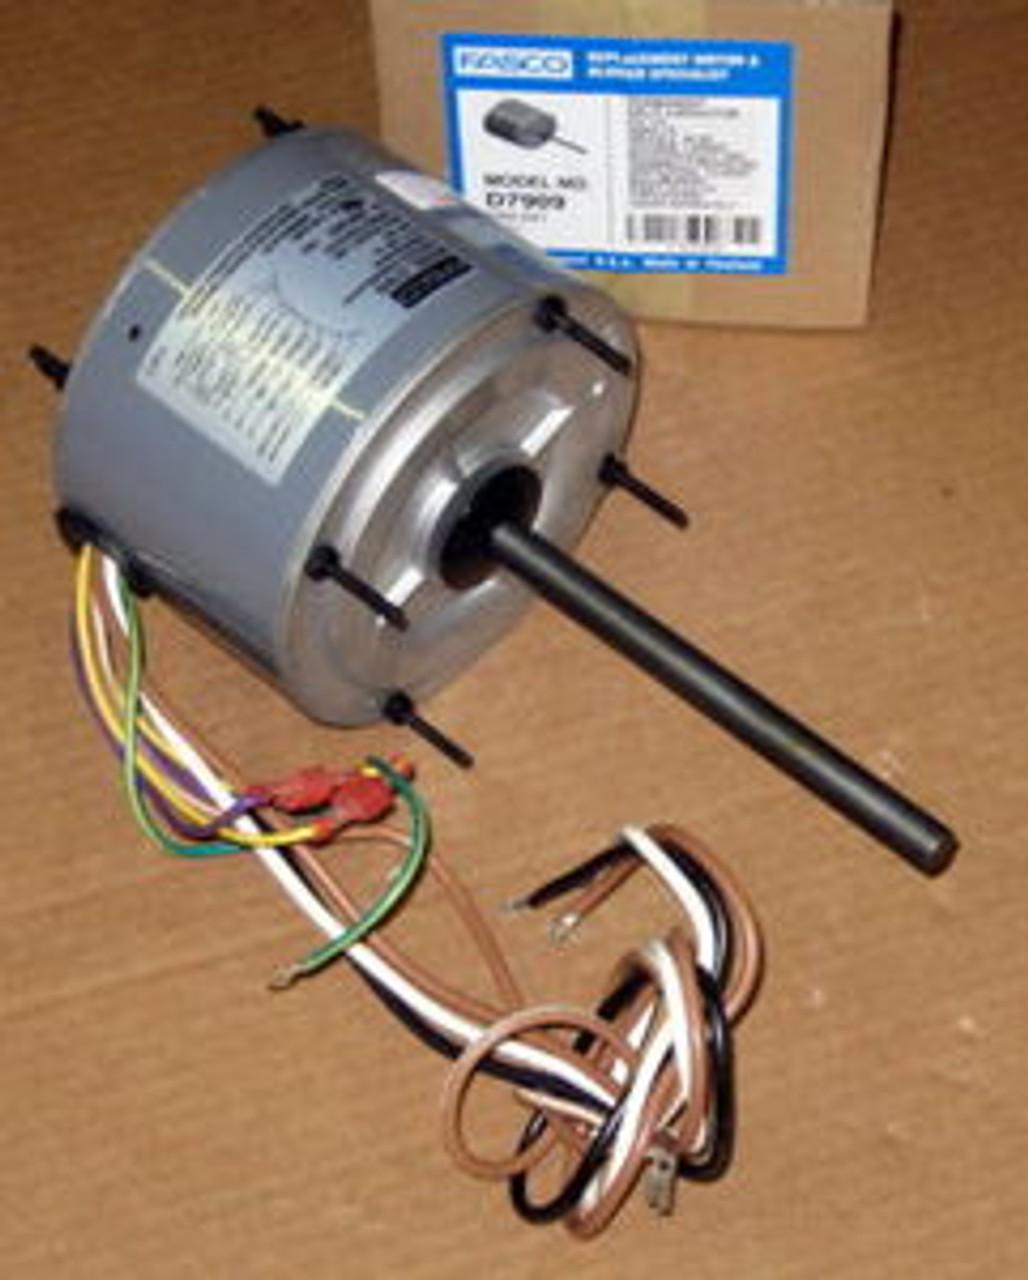 d7909 fasco 1 4 hp 1075 rpm air conditioner heat pump condenser fan motor tenv 4 wire fan motor wiring diagram hvac motor wiring diagram wiring diagram